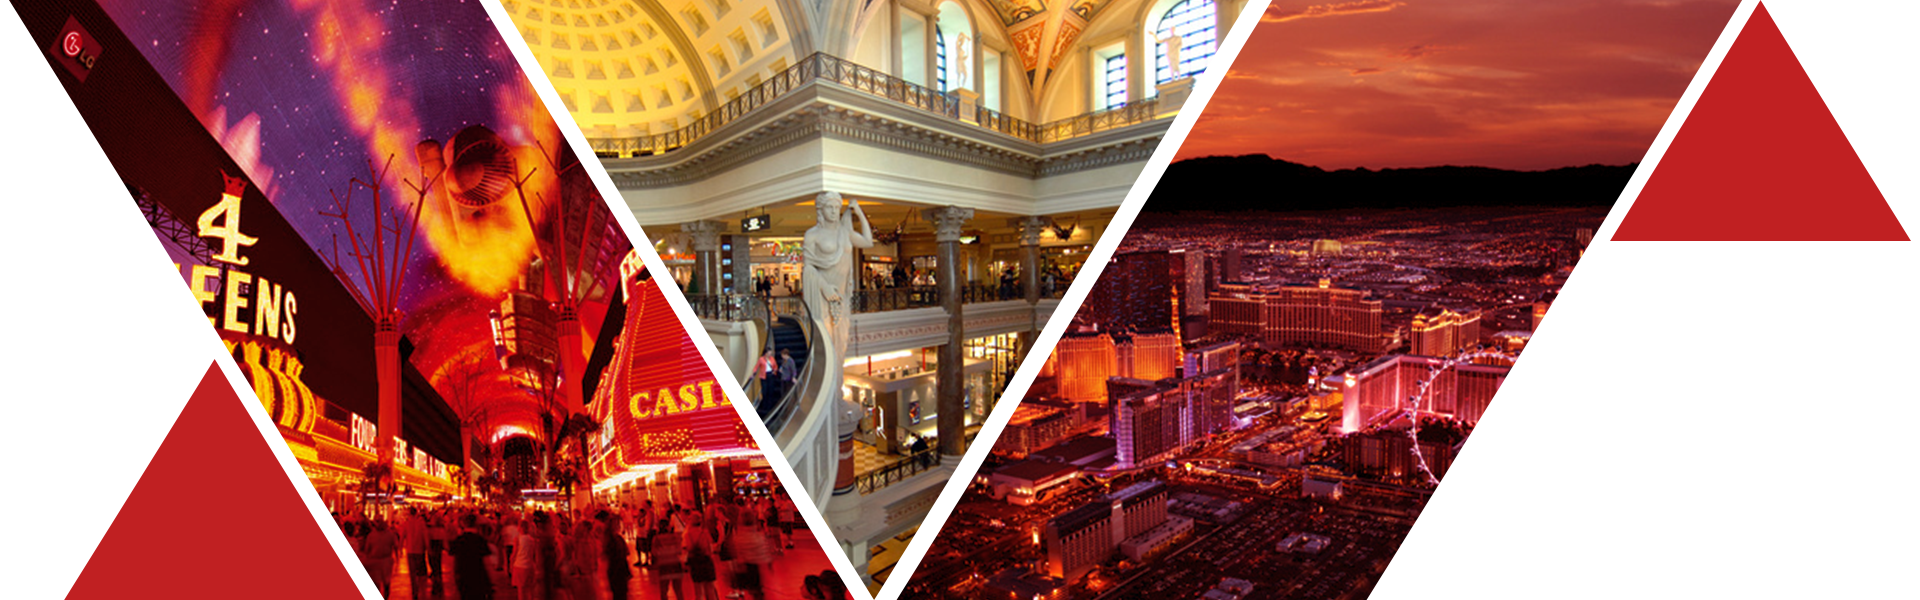 Spring break destinations: Las Vegas